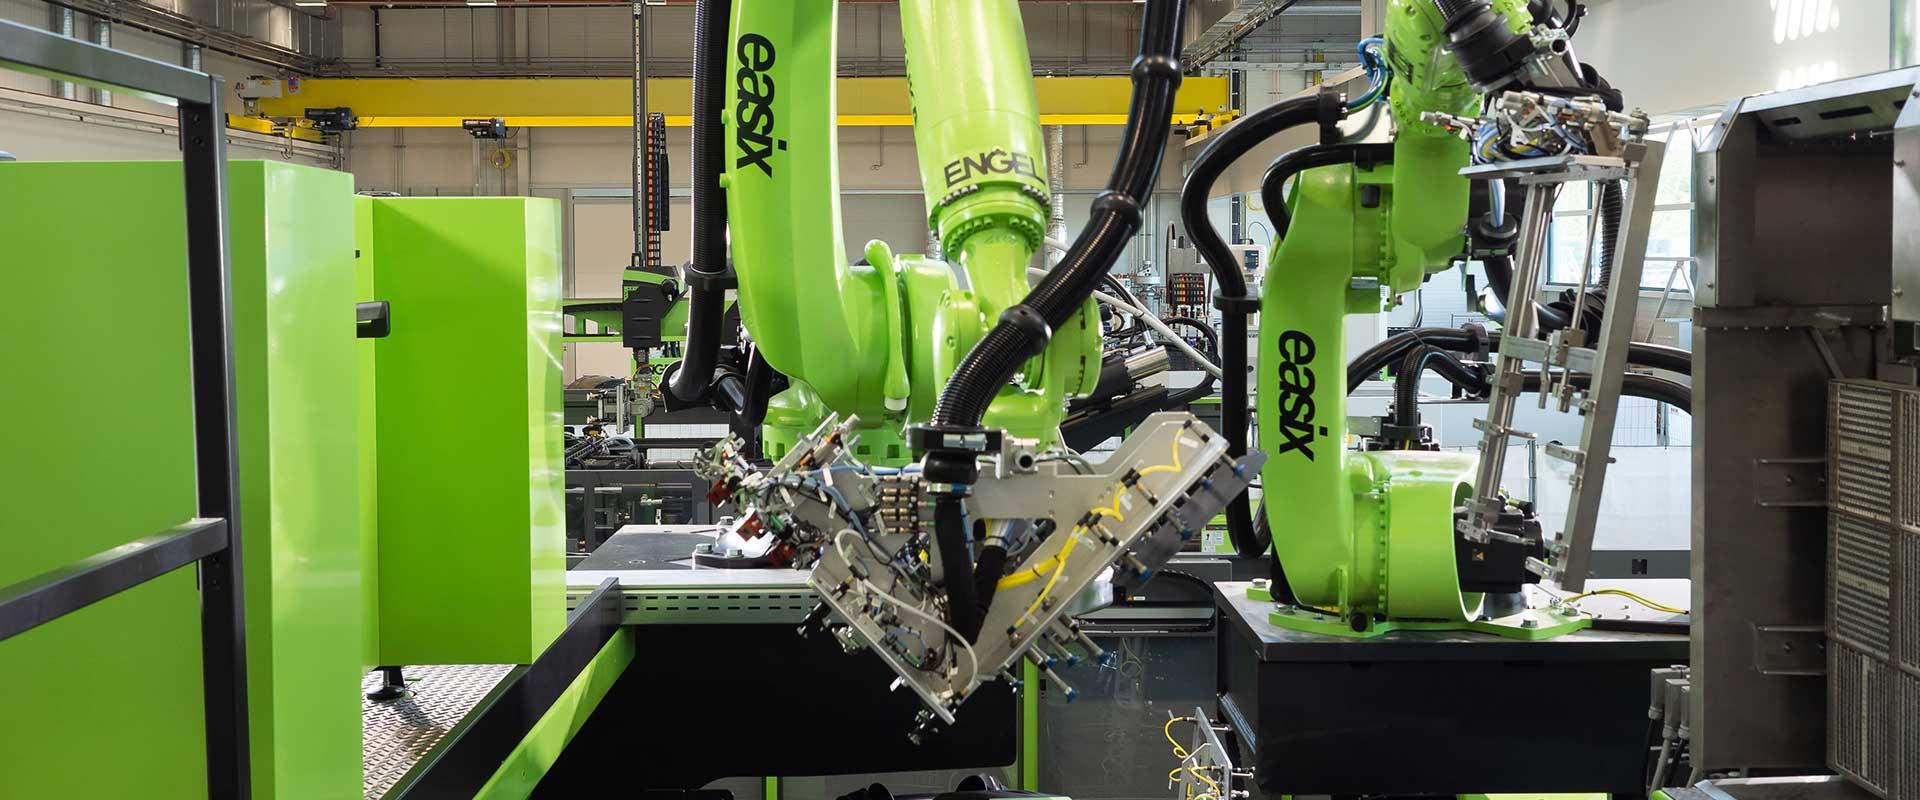 ENGEL Grippers Duo 800 P1000301 | GreenTech Machinery